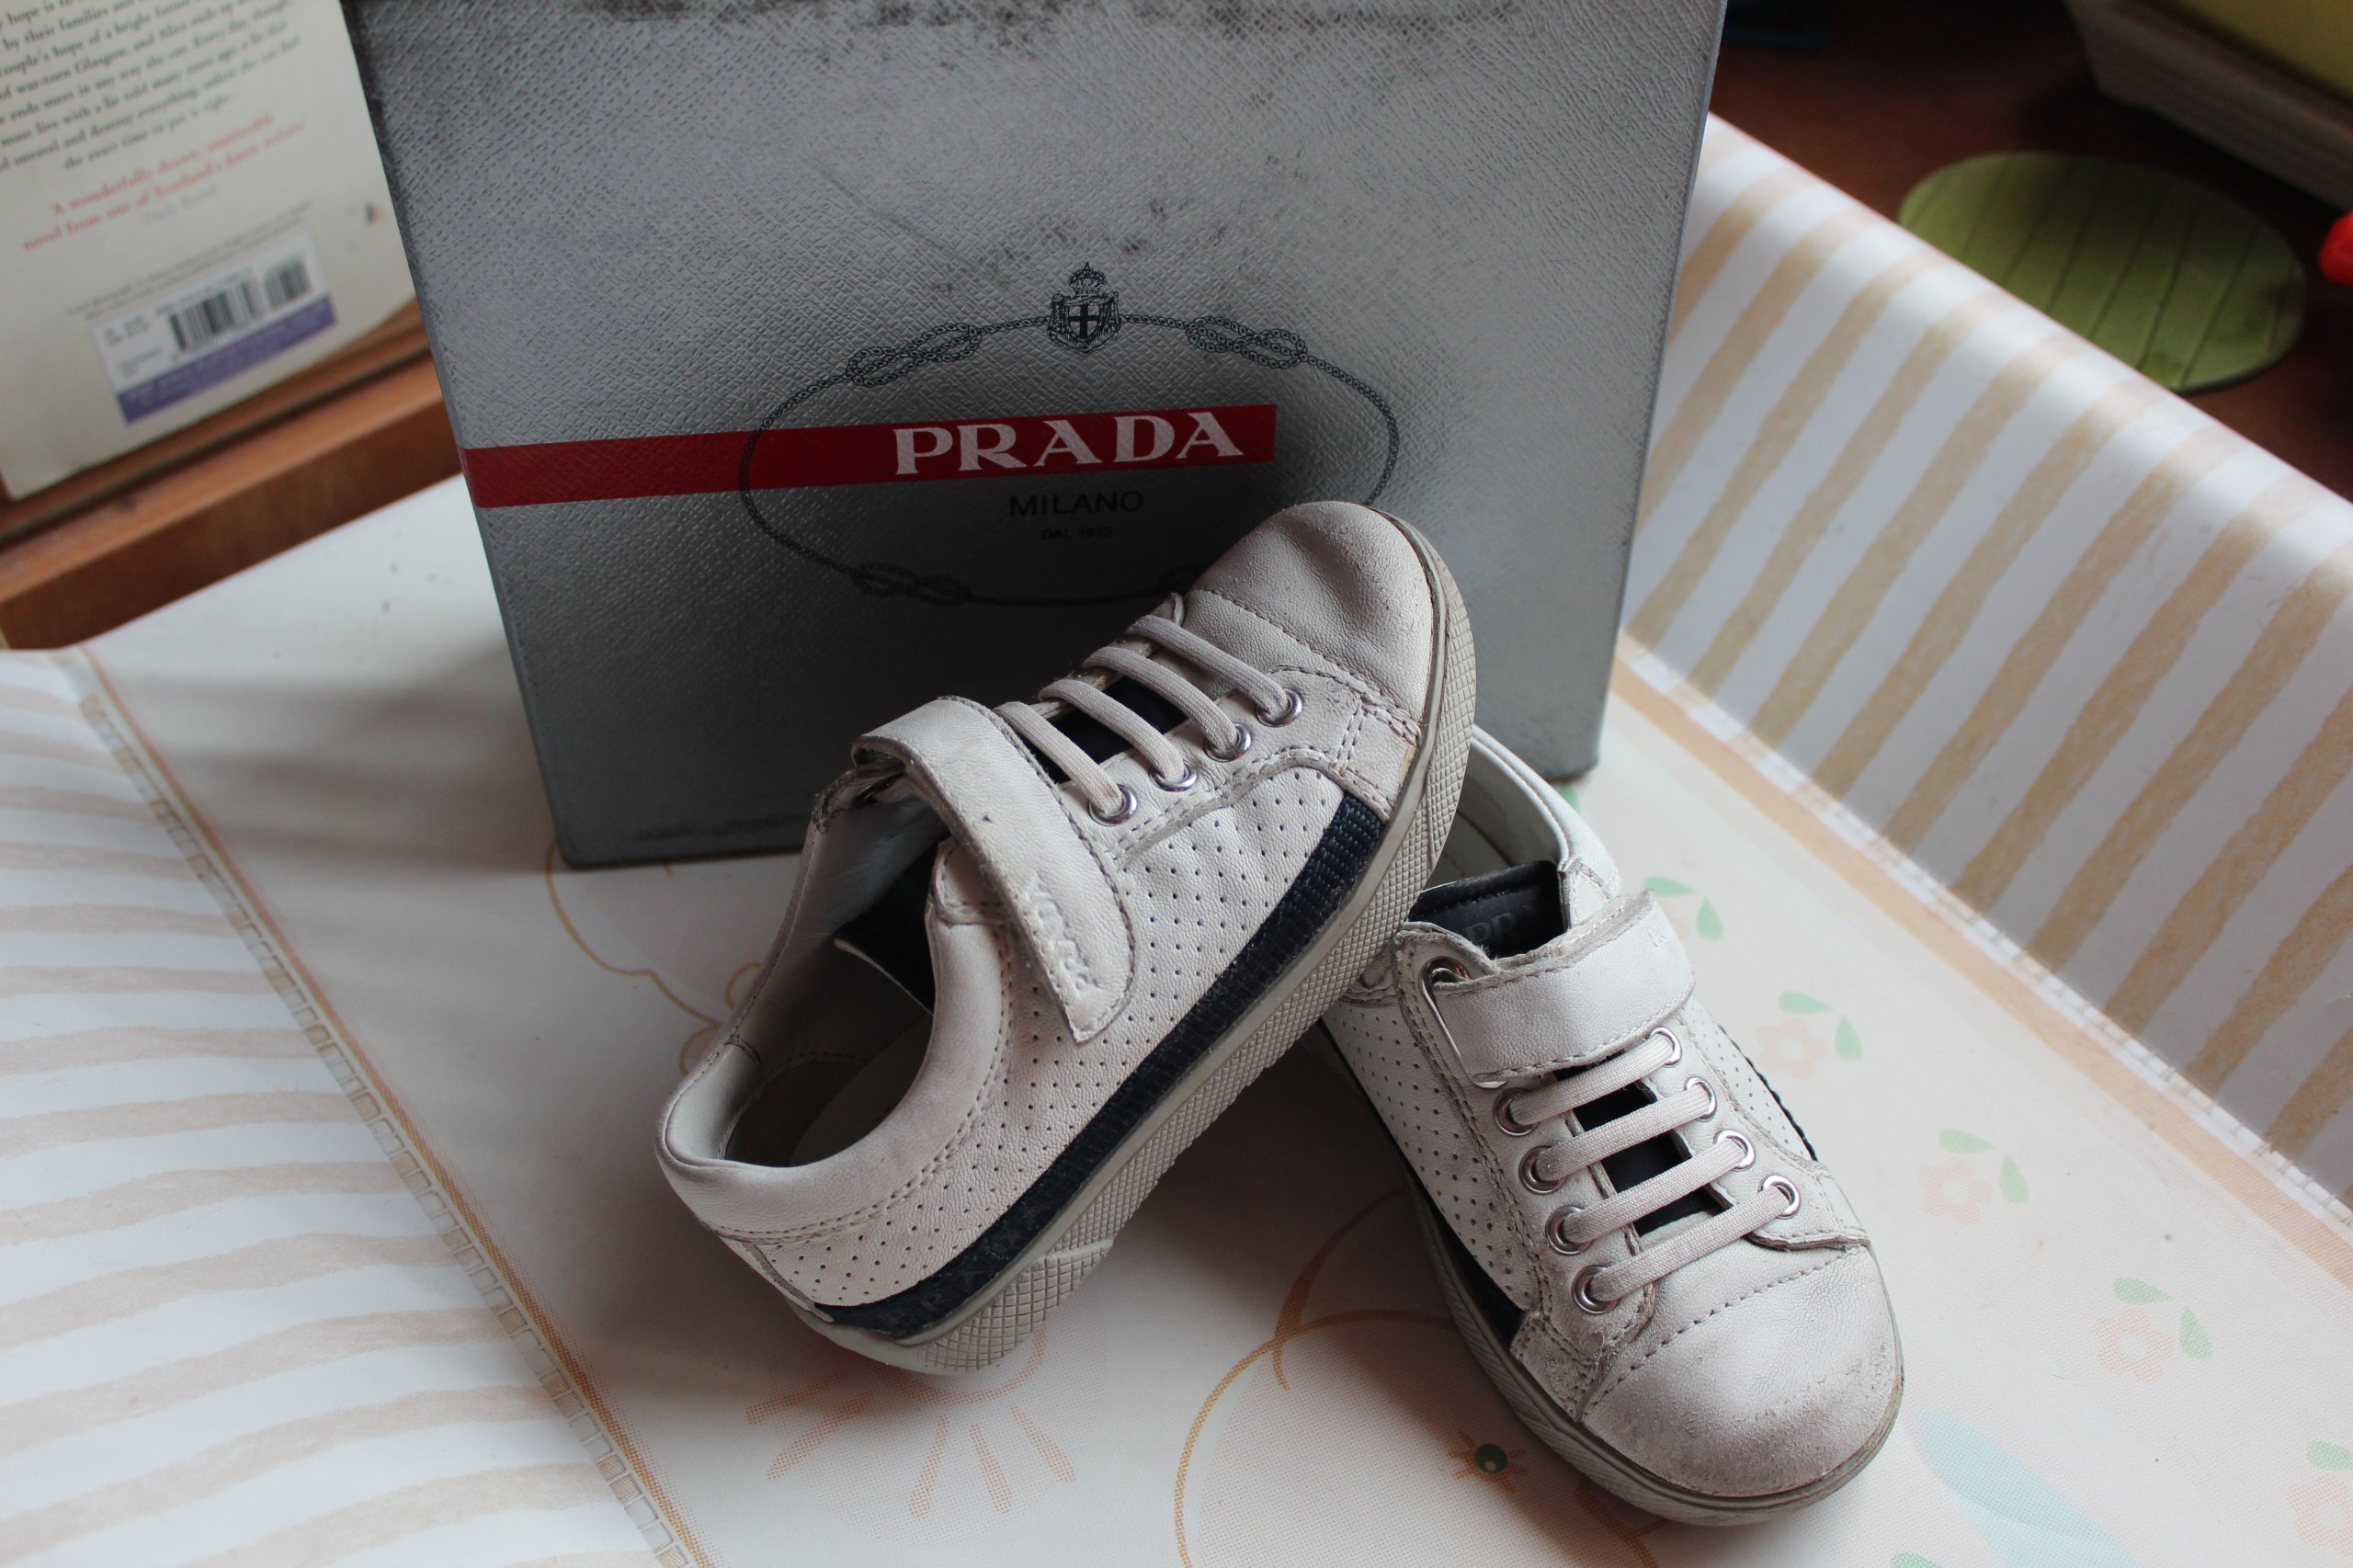 85f545247b53f PRADA półbuty adidasy pudełko skóra 24 15,5 - 16cm - 7295910709 ...